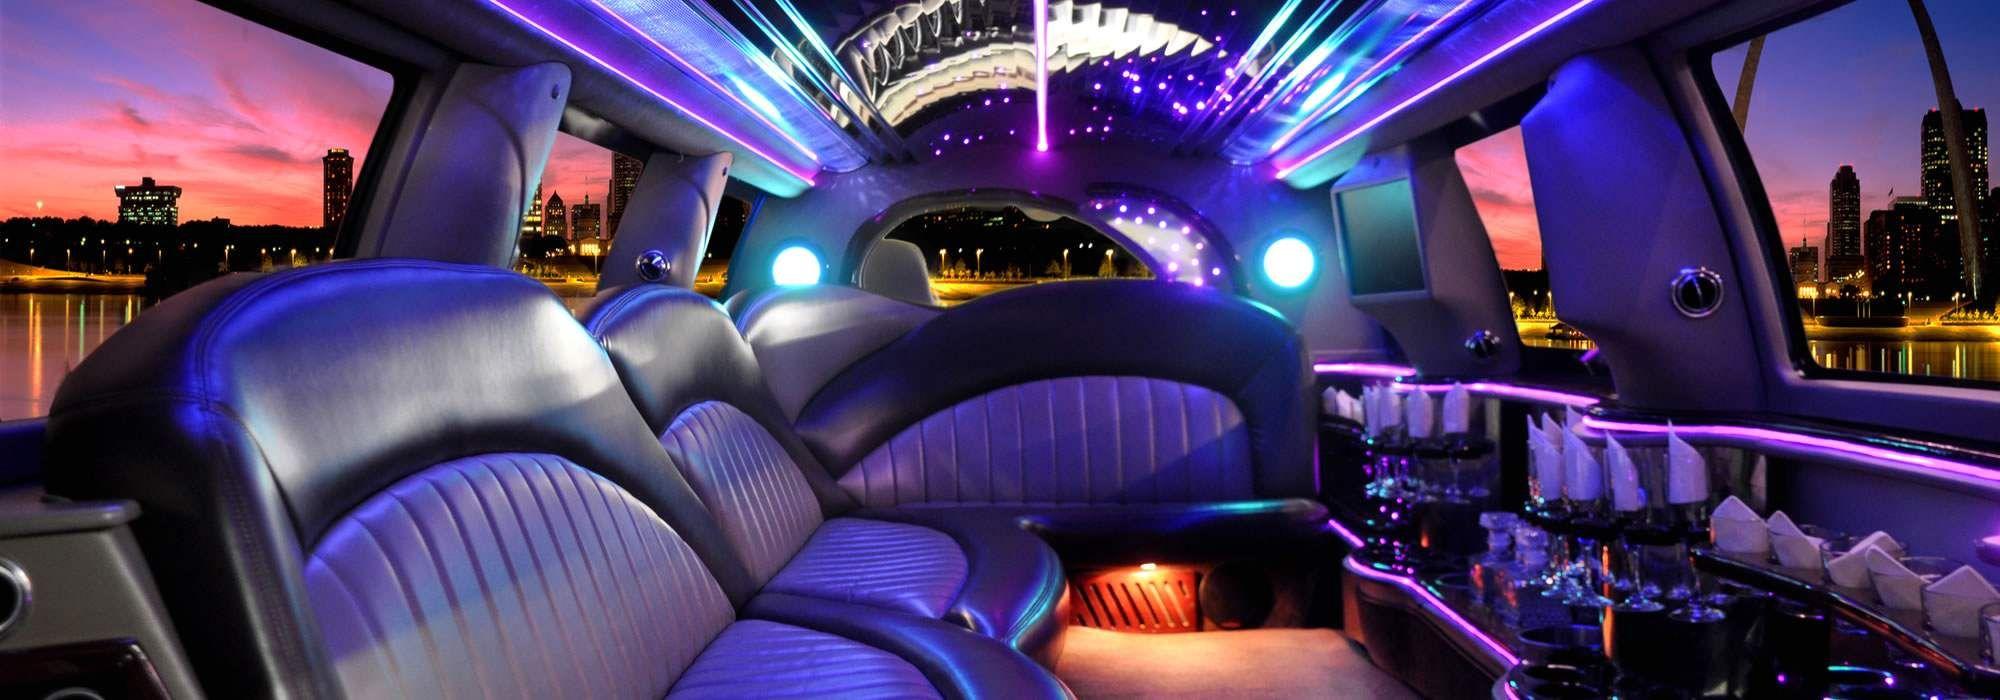 Limousine Lincoln Stretch 2000